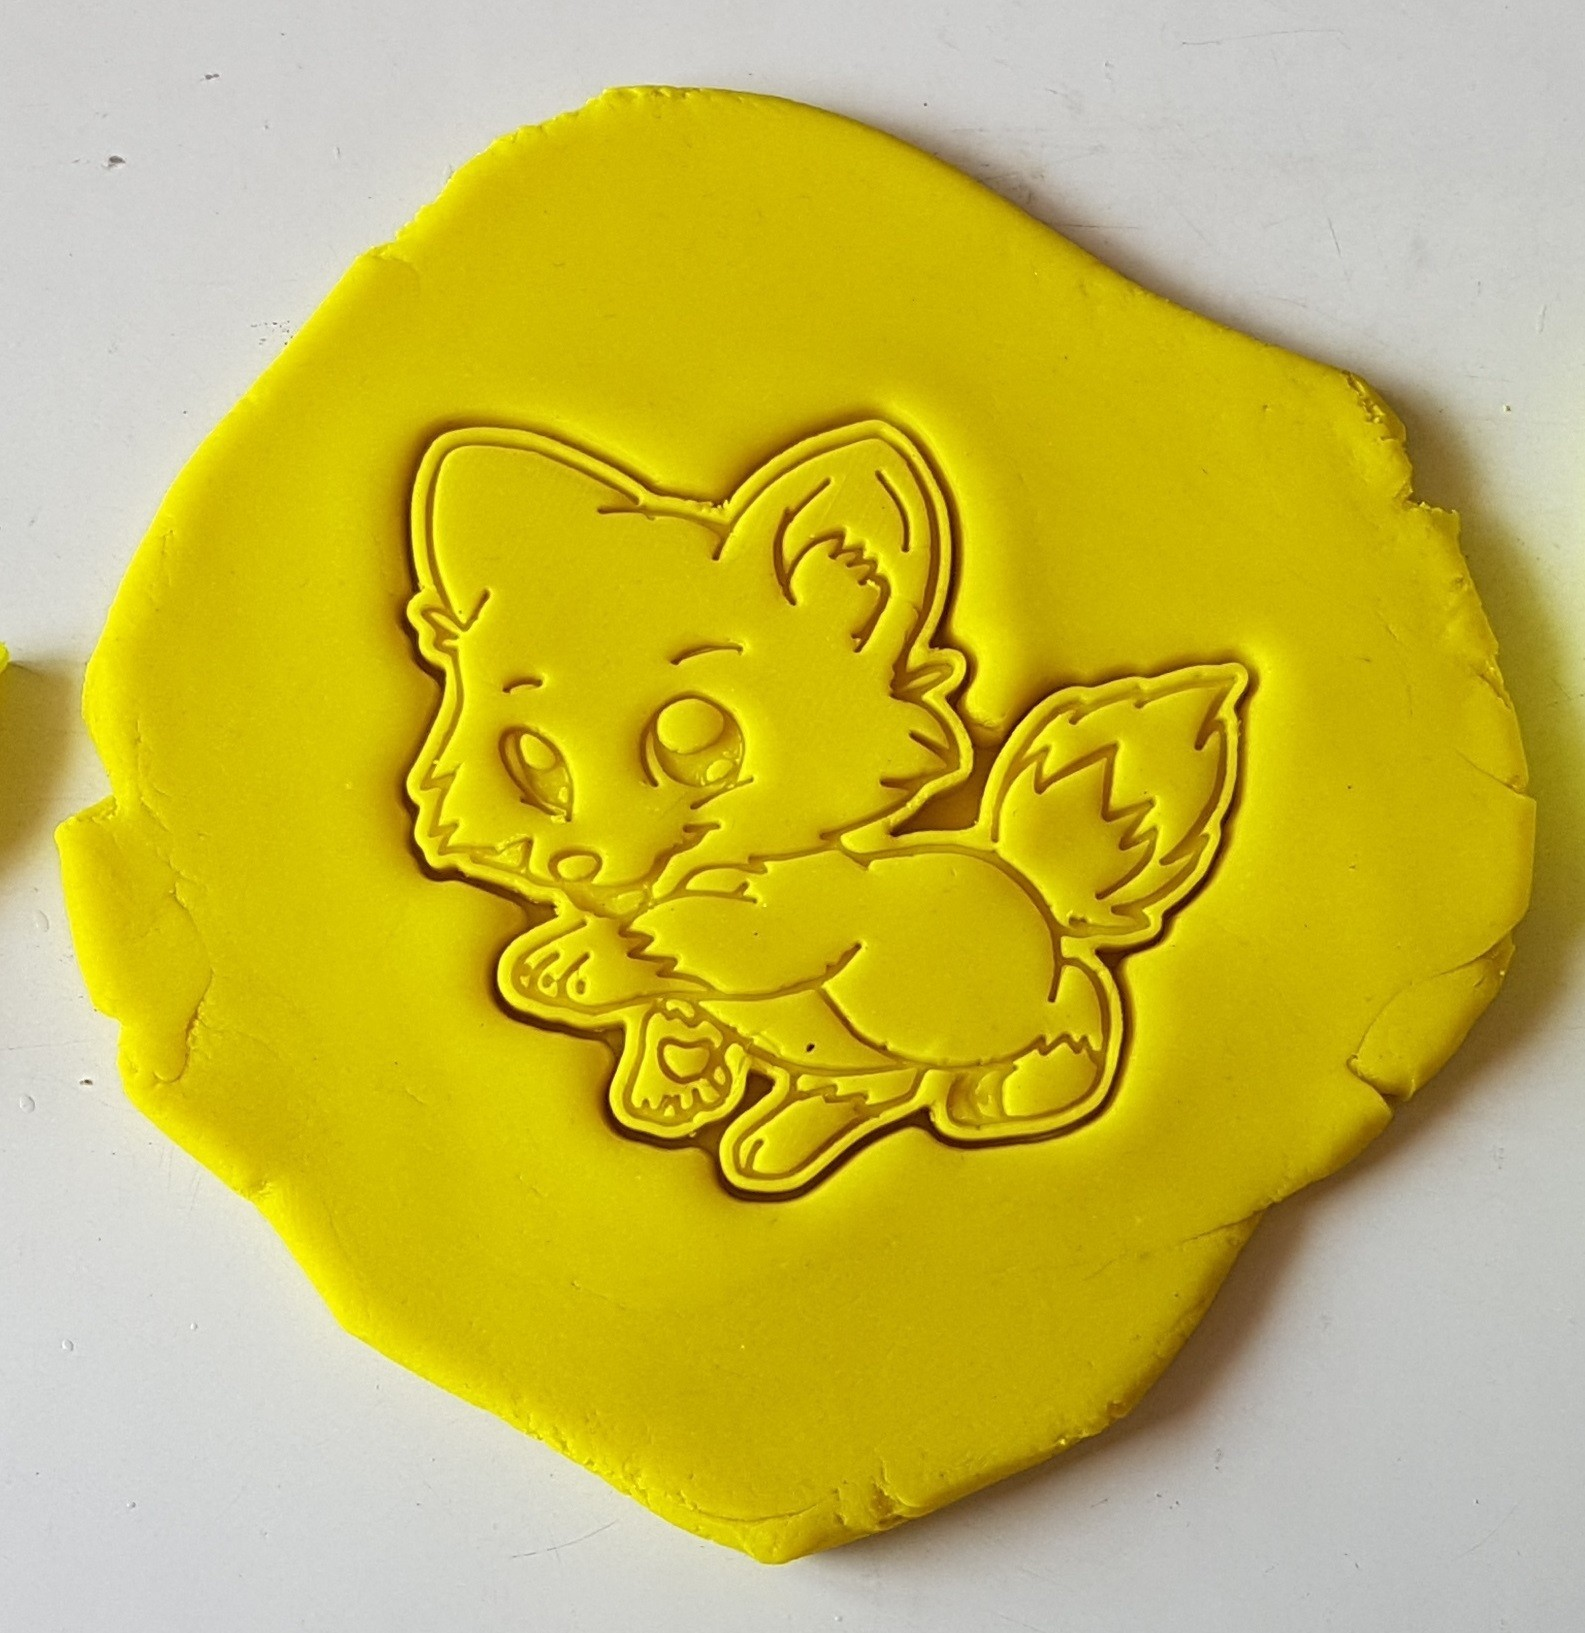 3.jpg Download STL file Cute Fox Cookie Cutter • 3D printer template, 3dfactory